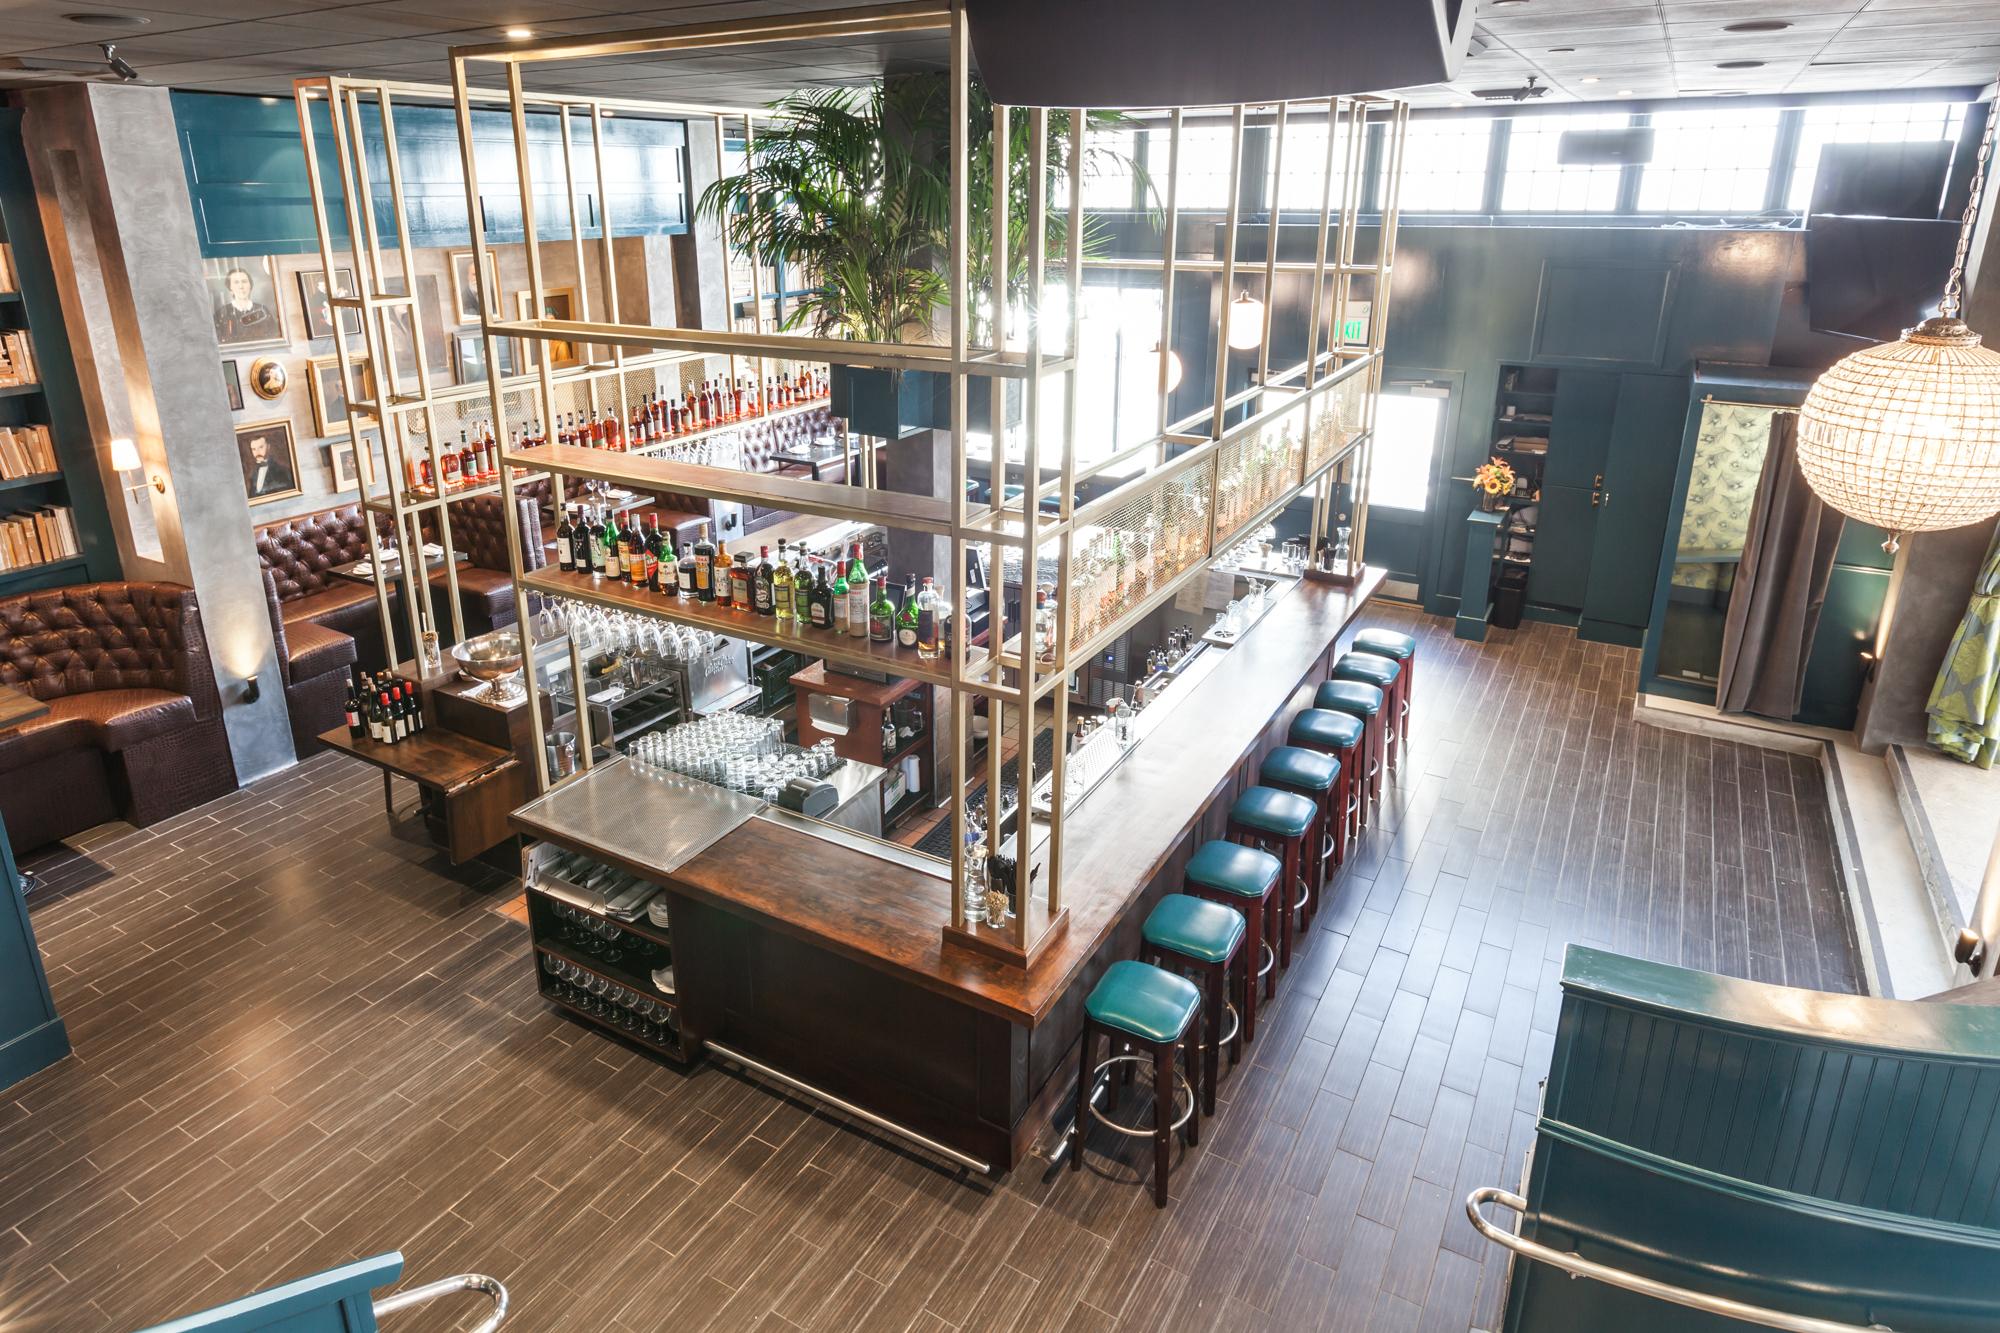 The bar at The Dorian.